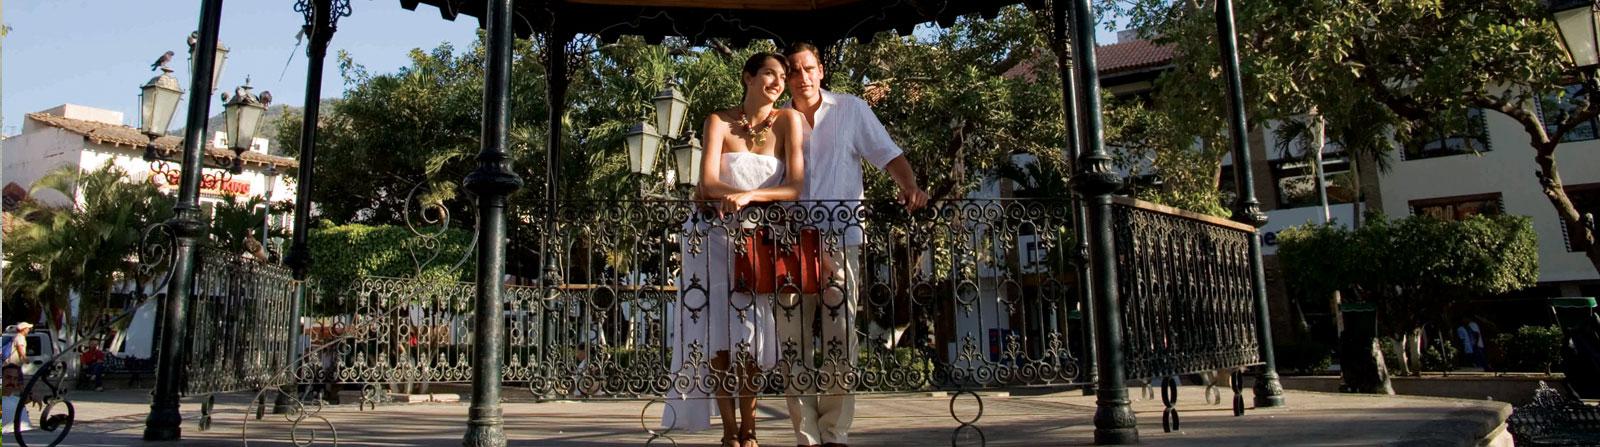 Destinos do Grand Velas Riviera Nayarit México